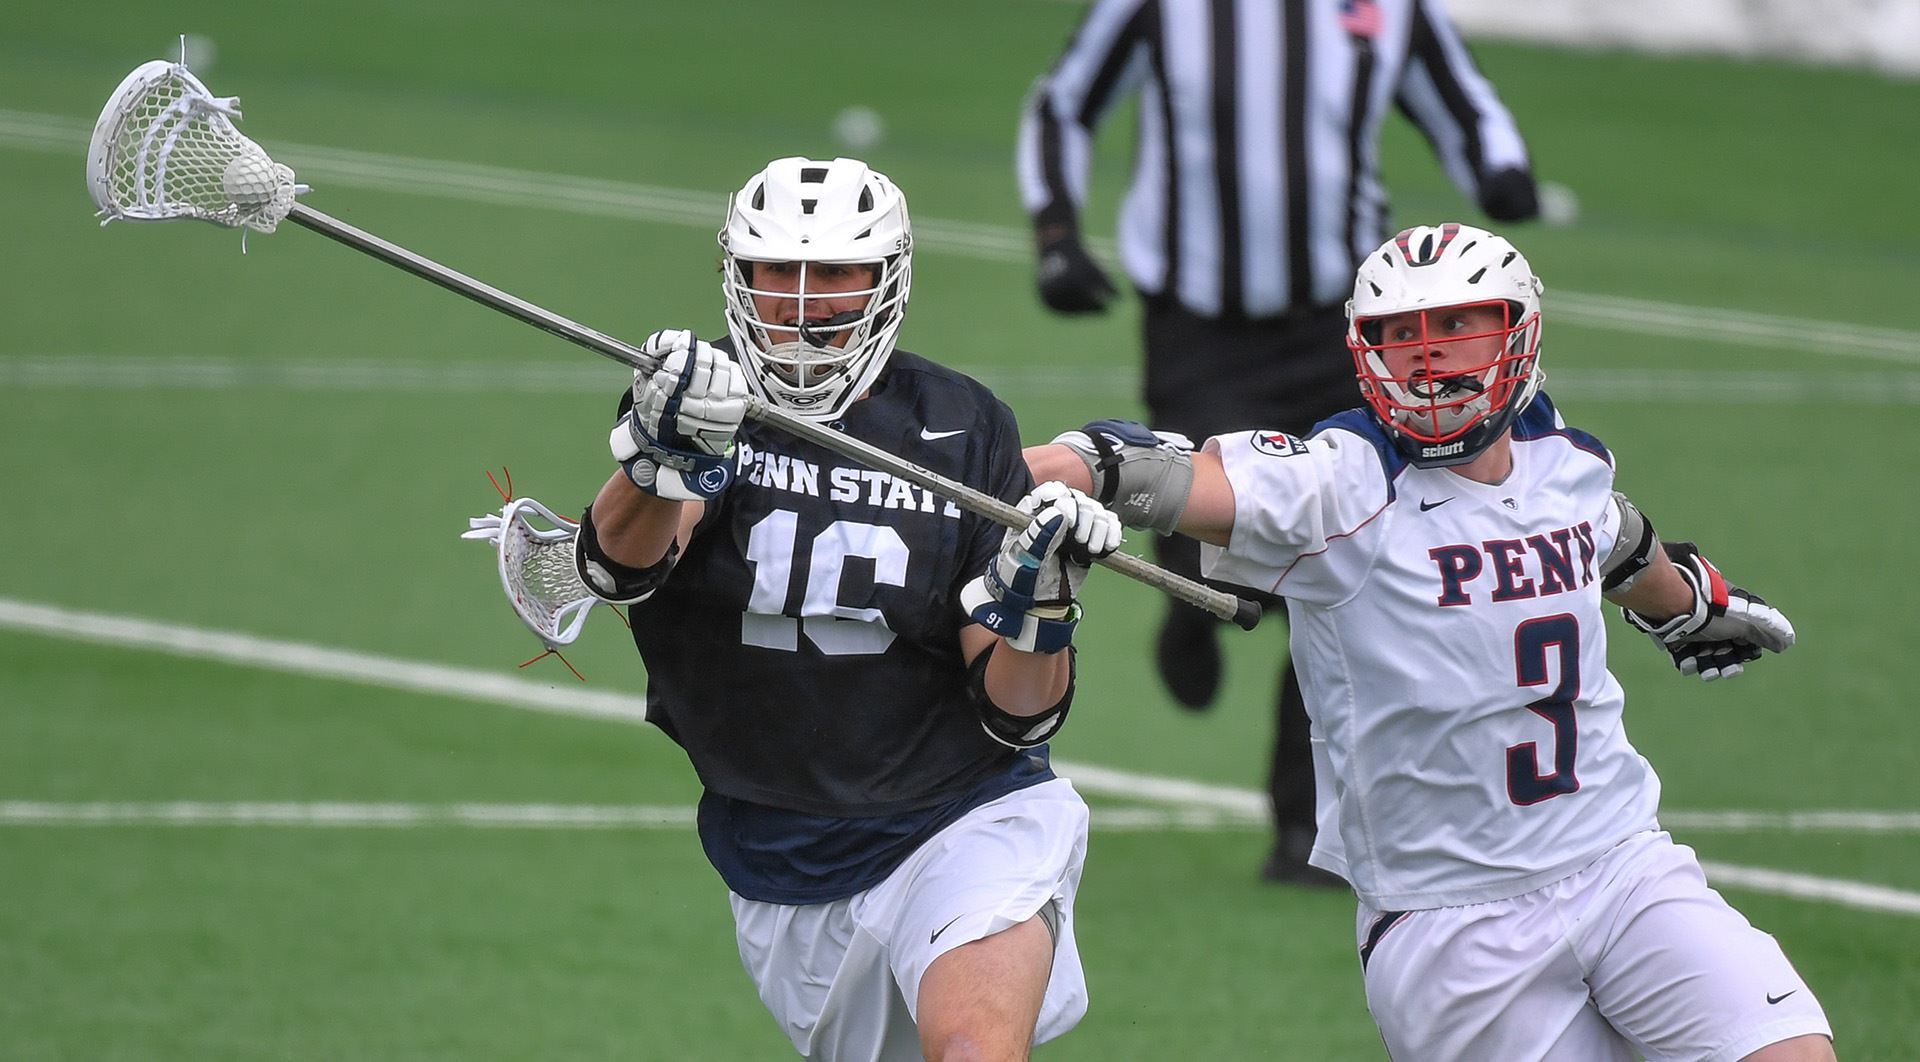 Di Men S Lacrosse Bracket Takeaways Yale S Path Not Easy Towson Vs